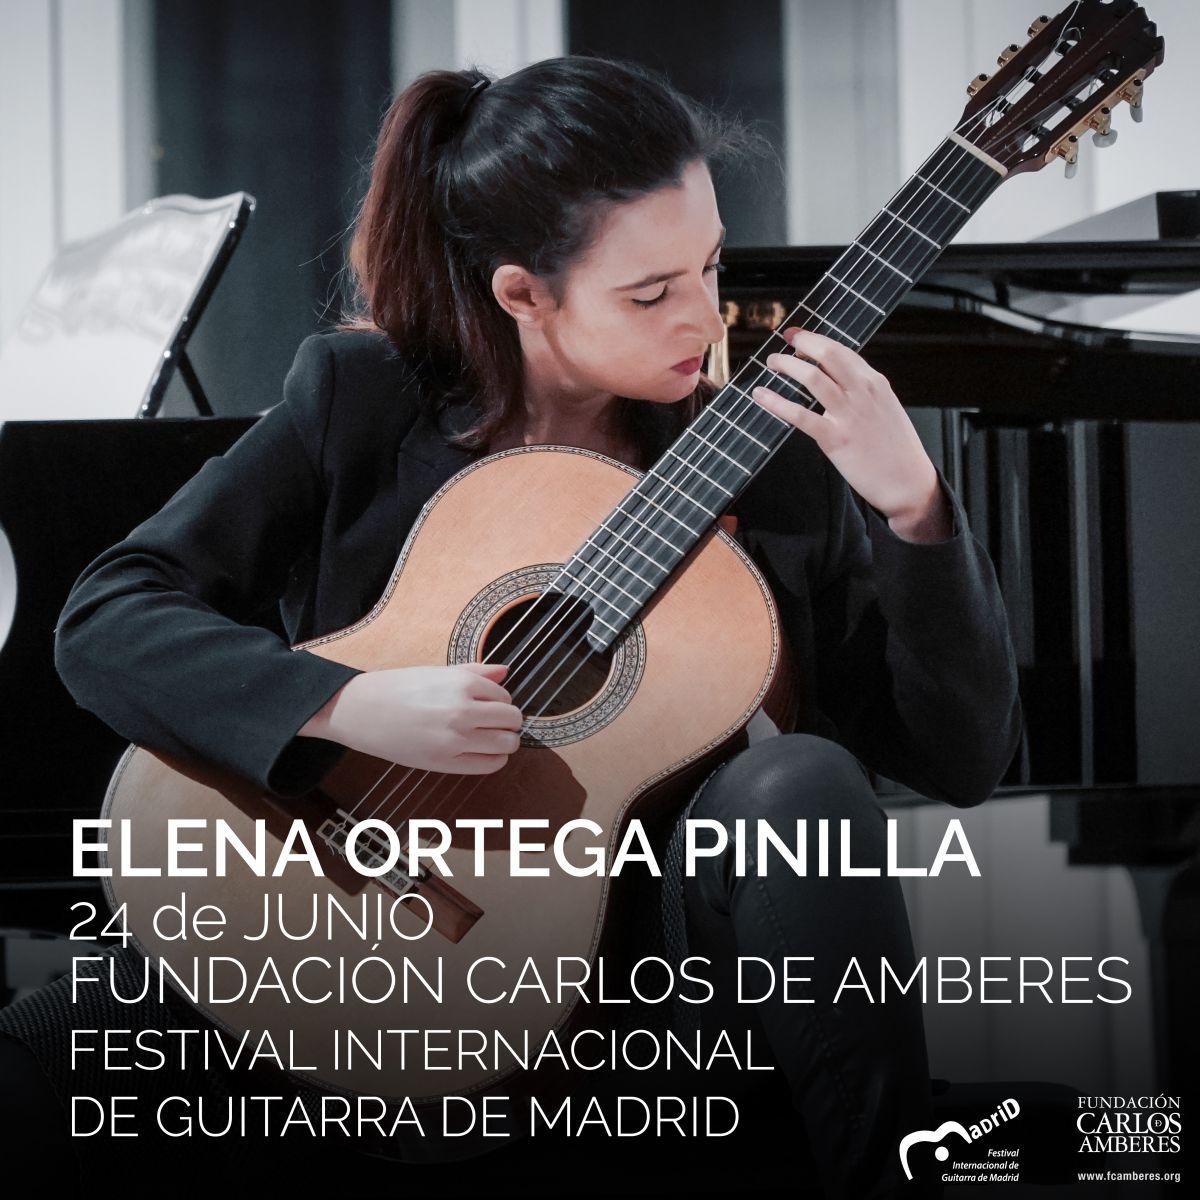 Festival Internacional de Guitarra - Elena Ortega